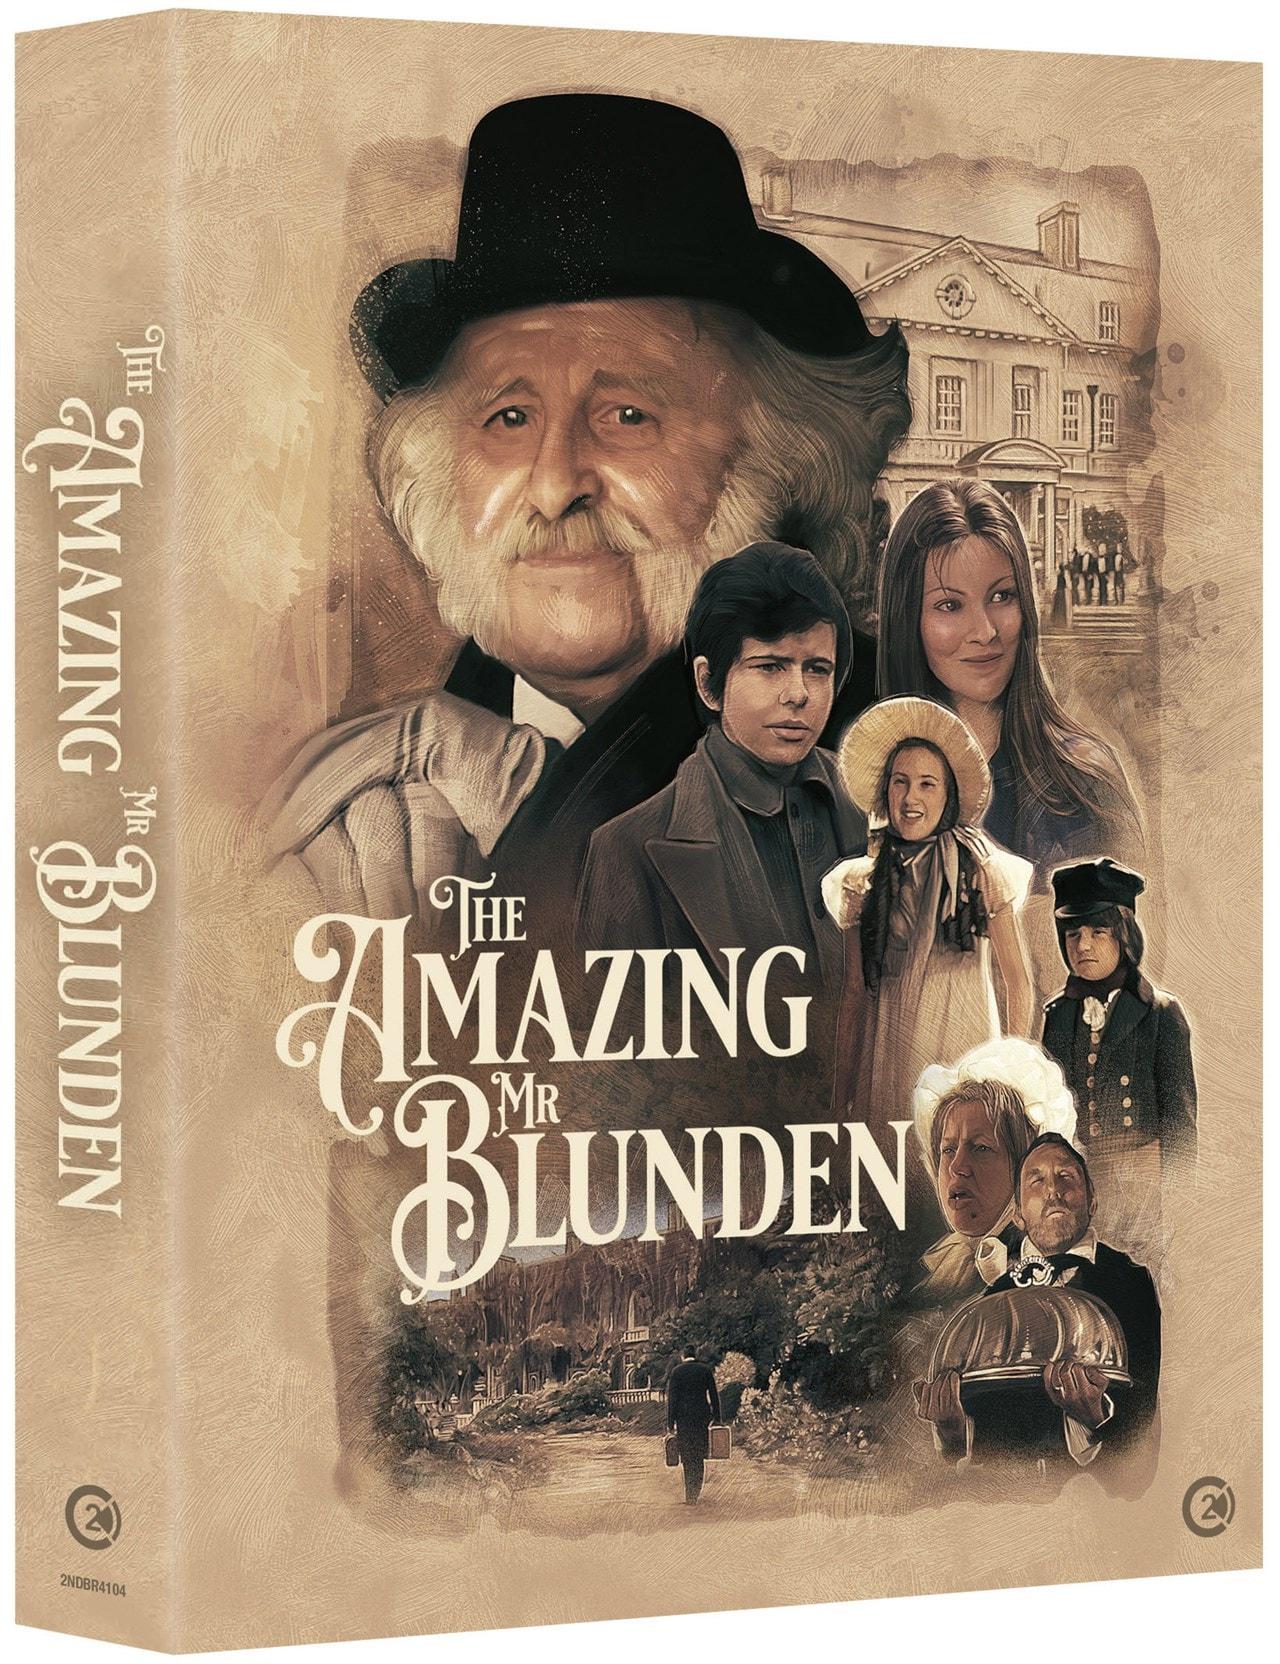 The Amazing Mr Blunden - 1